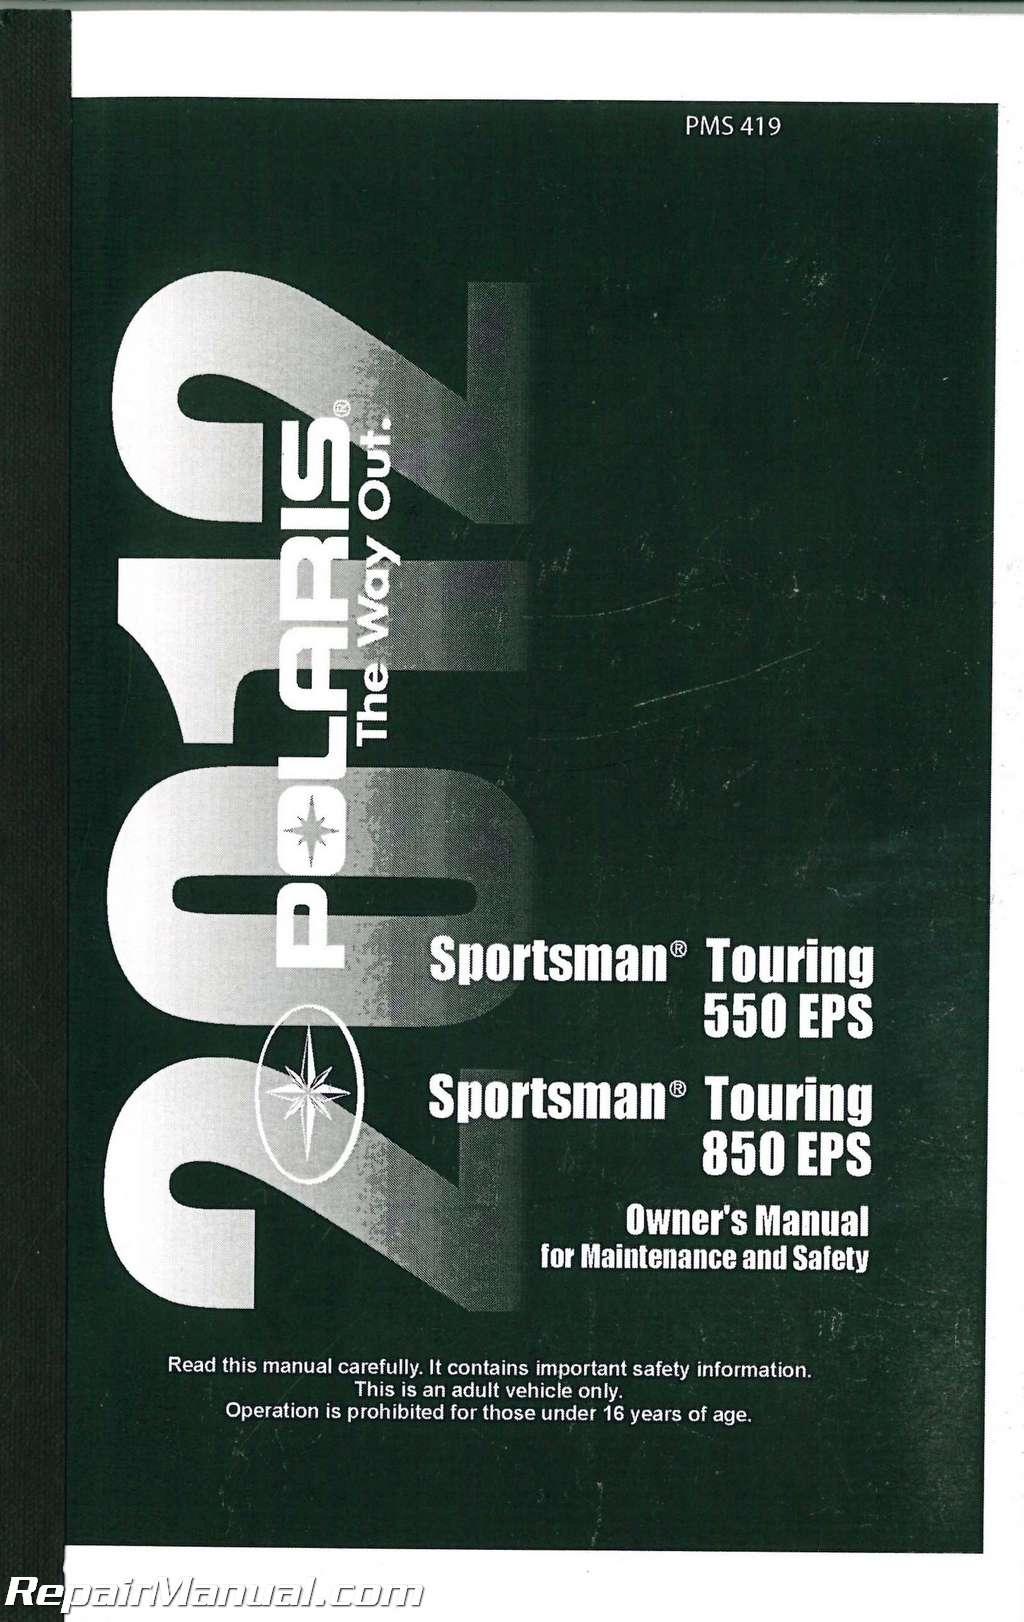 2012 polaris sportsman touring eps 550 eps 850 atv owners manual rh repairmanual com 2006 polaris sportsman 800 efi repair manual 2006 polaris sportsman 800 service manual pdf